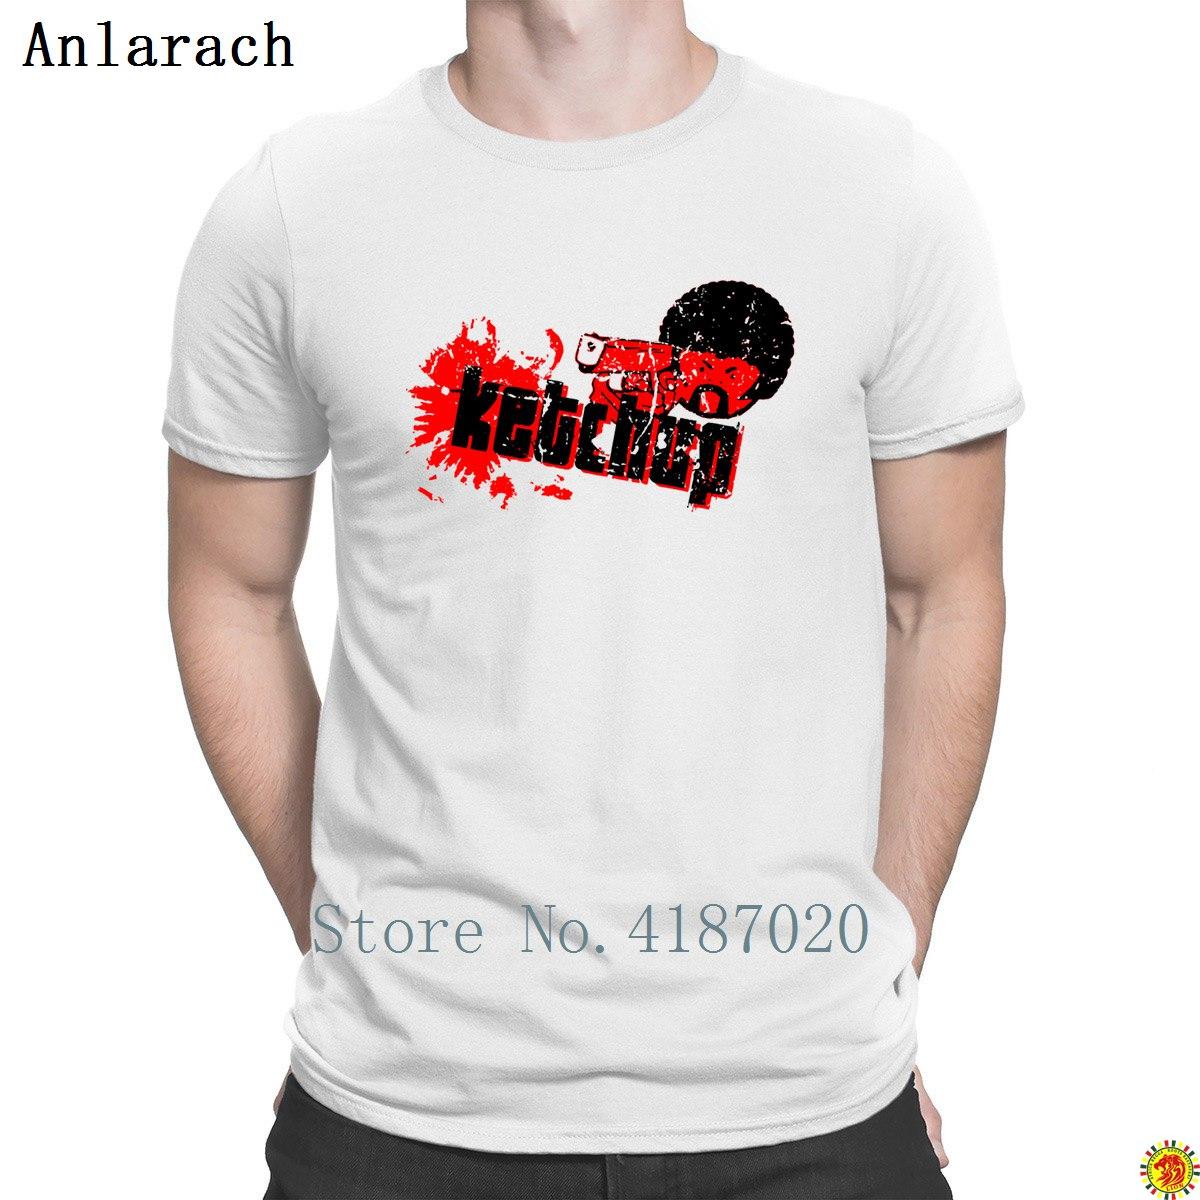 pulp-fiction-quentin-font-b-tarantino-b-font-ketchup-tshirt-weird-graphic-summer-style-popular-t-shirt-for-men-hiphop-round-collar-creature